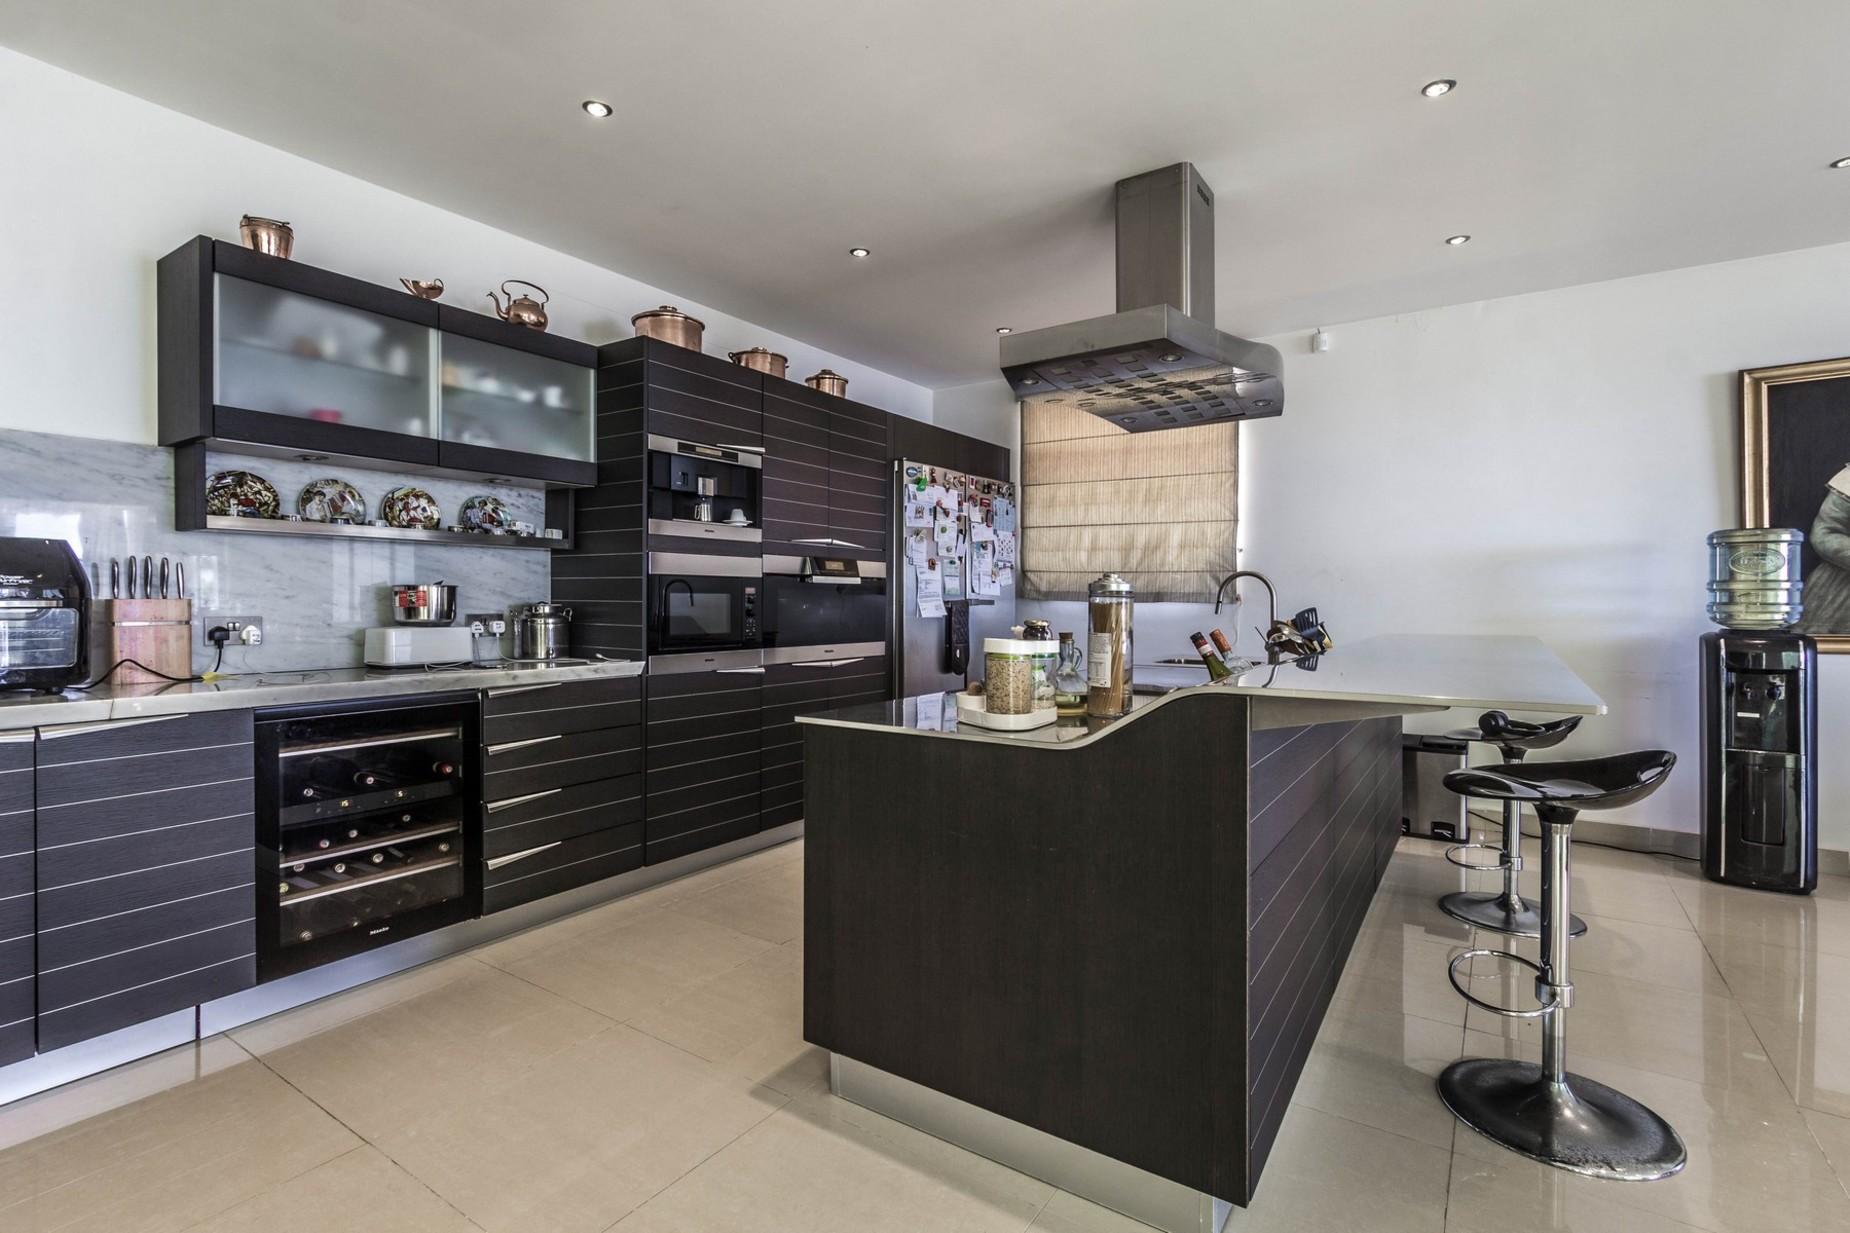 3 bed Villa For Sale in Marsascala, Marsascala - thumb 24